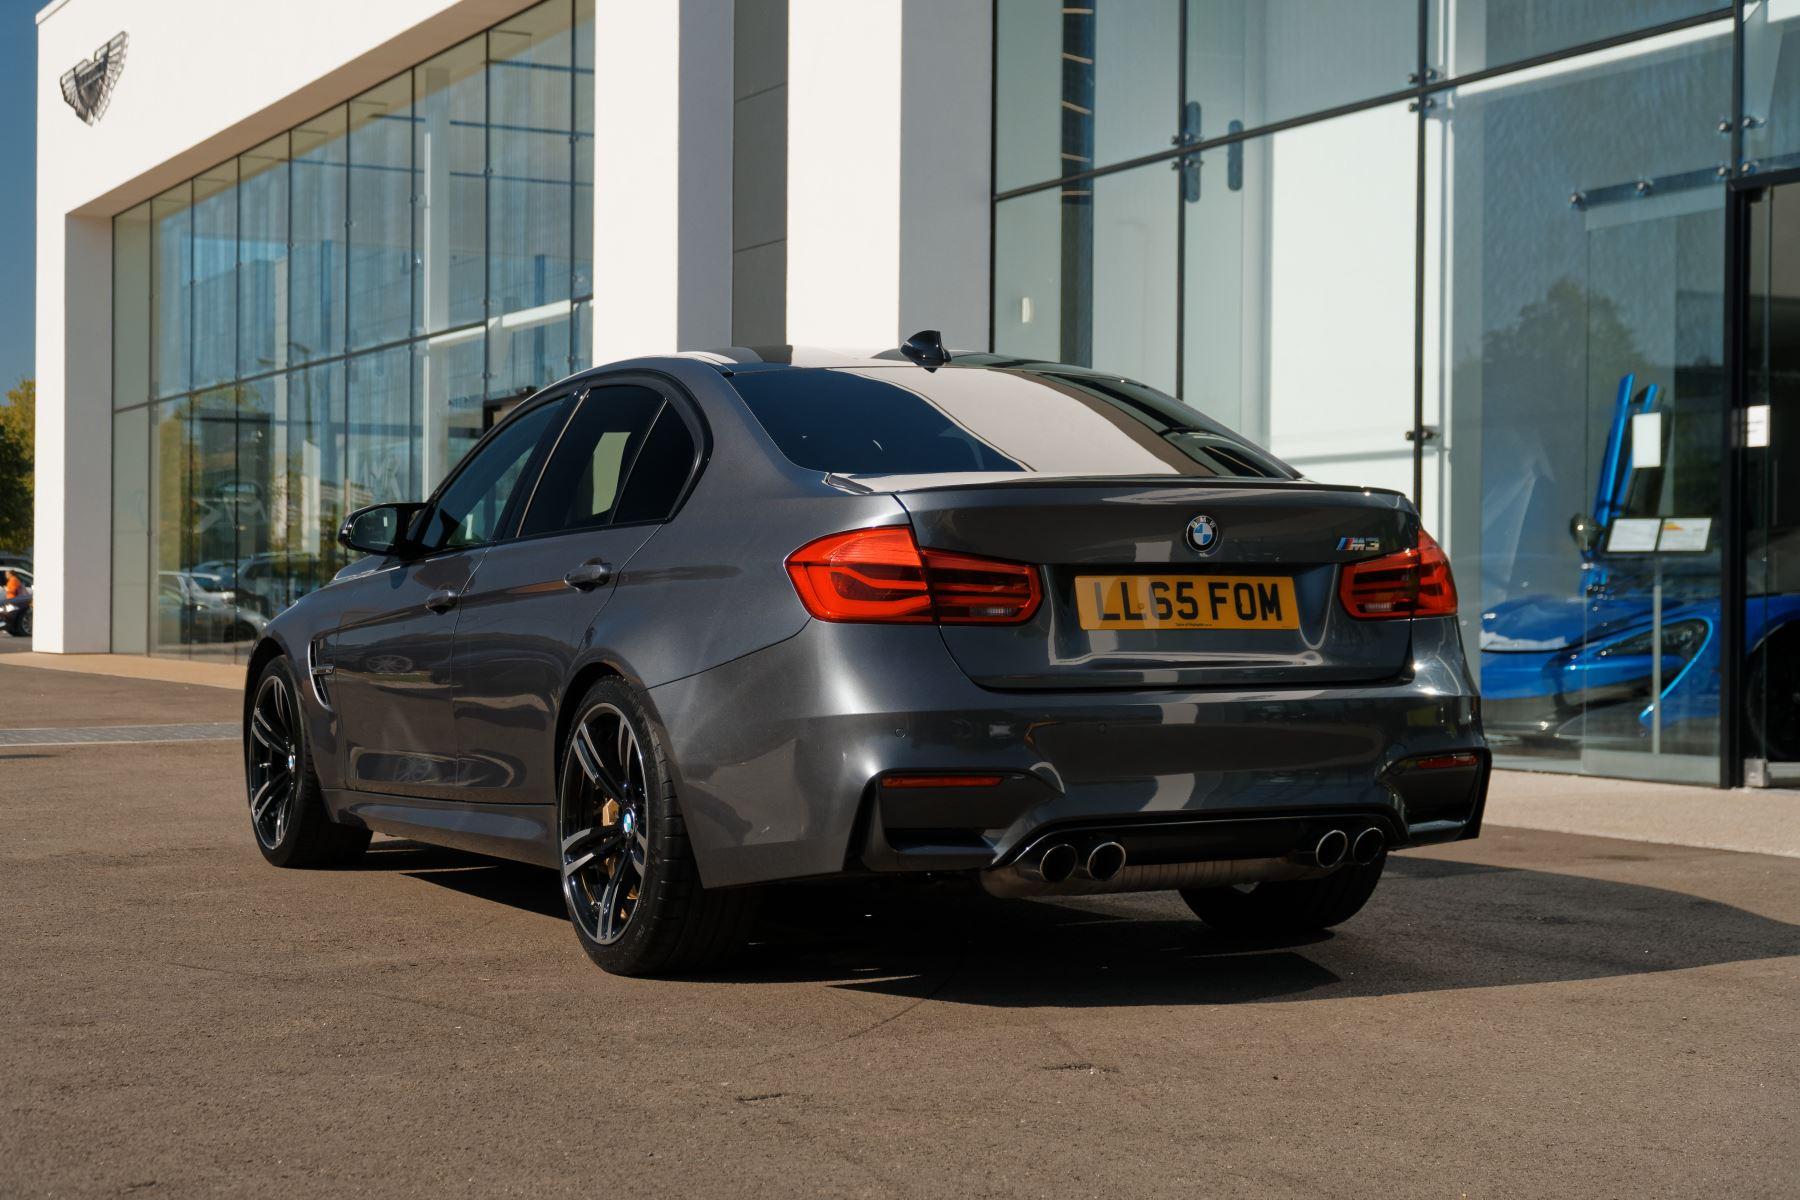 BMW M3 Saloon  image 3